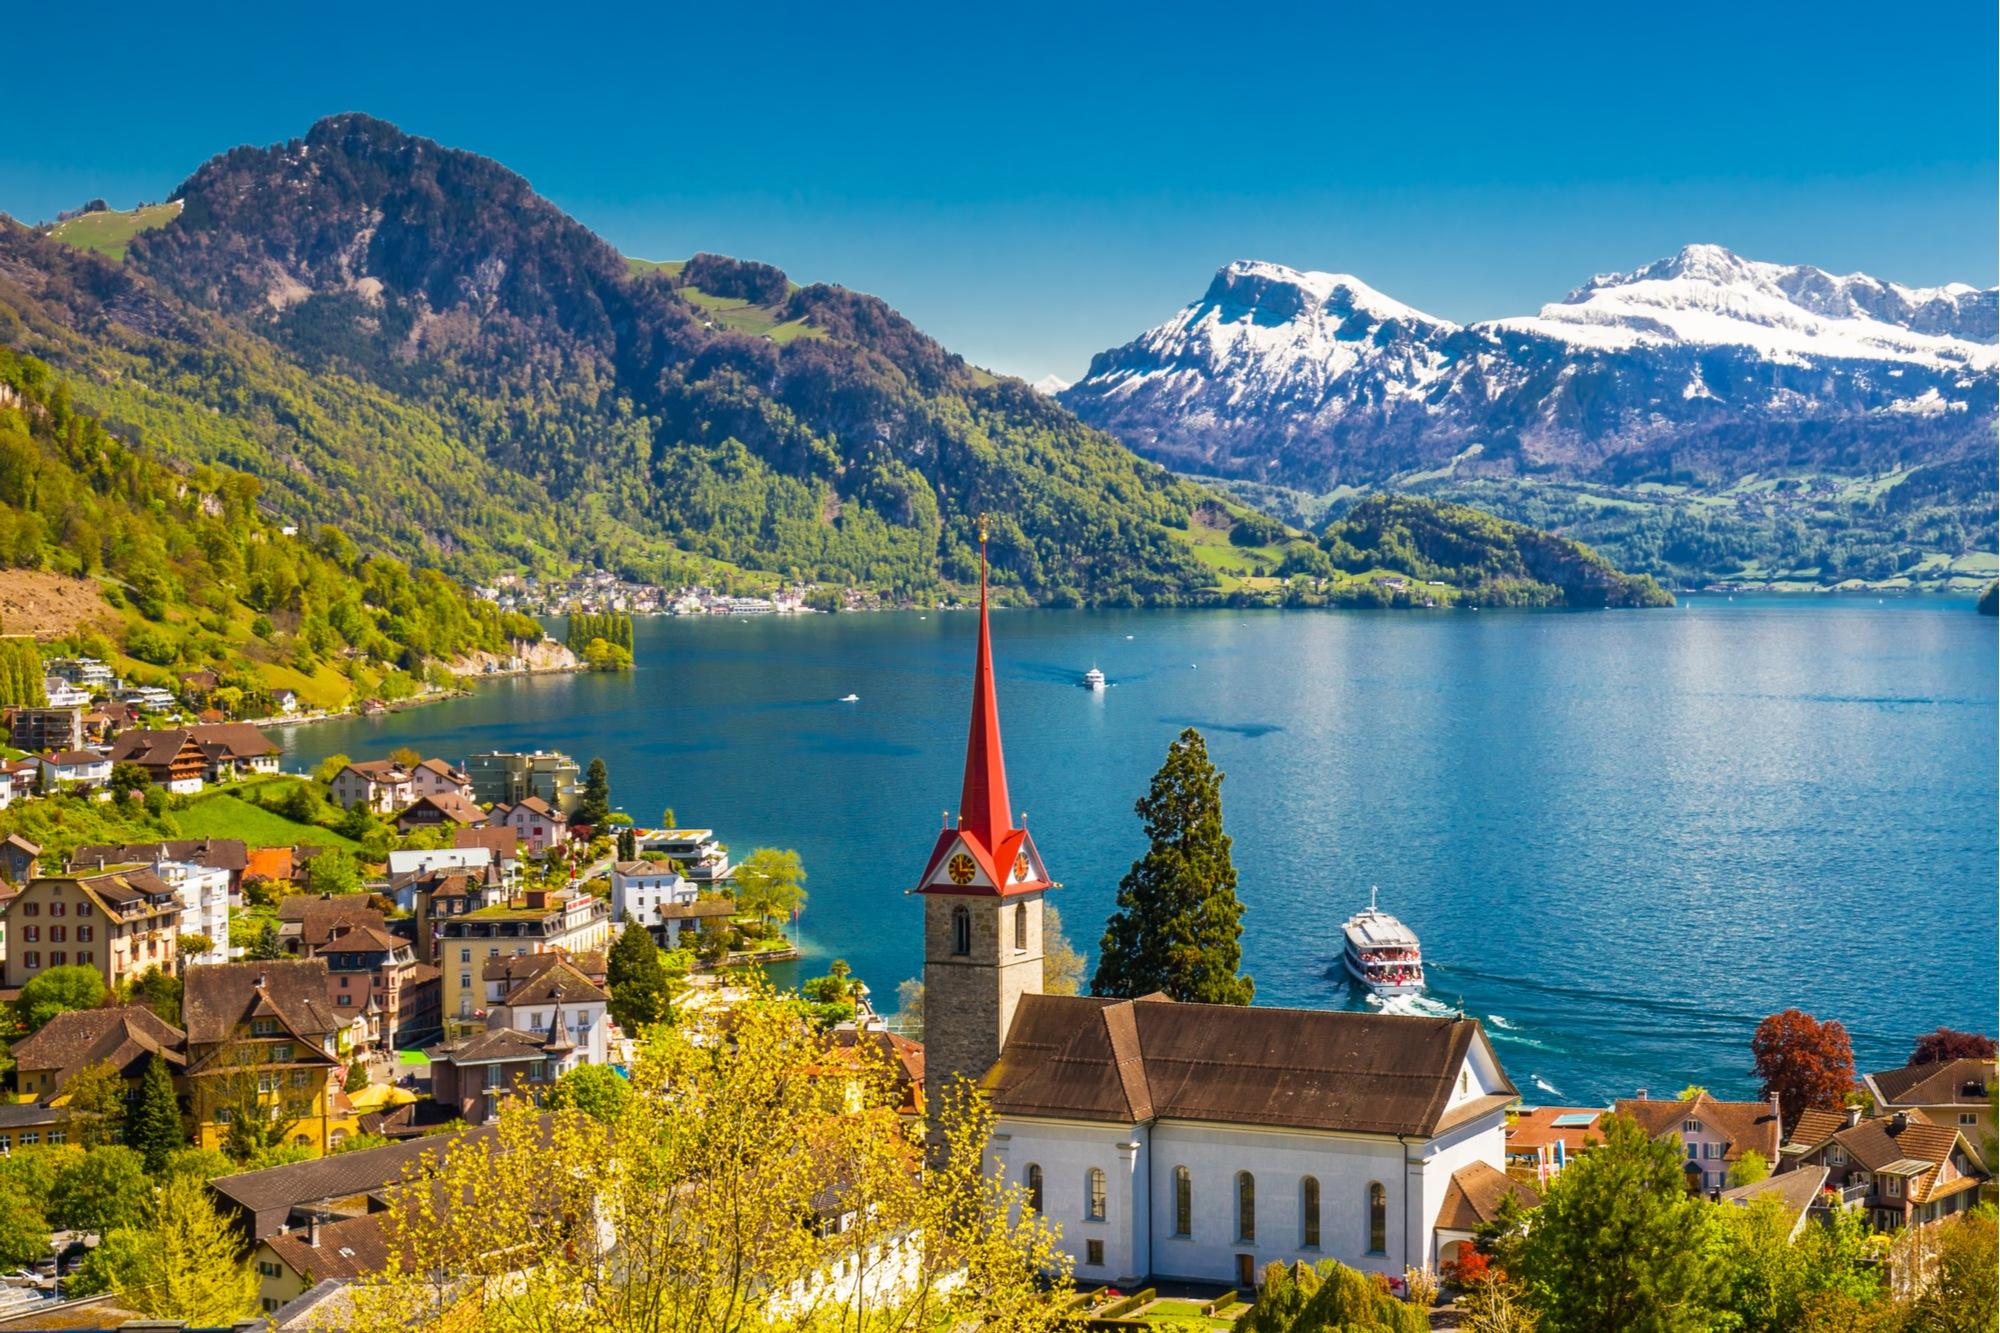 lake lucerne, switzerland honeymoon road trips in europe